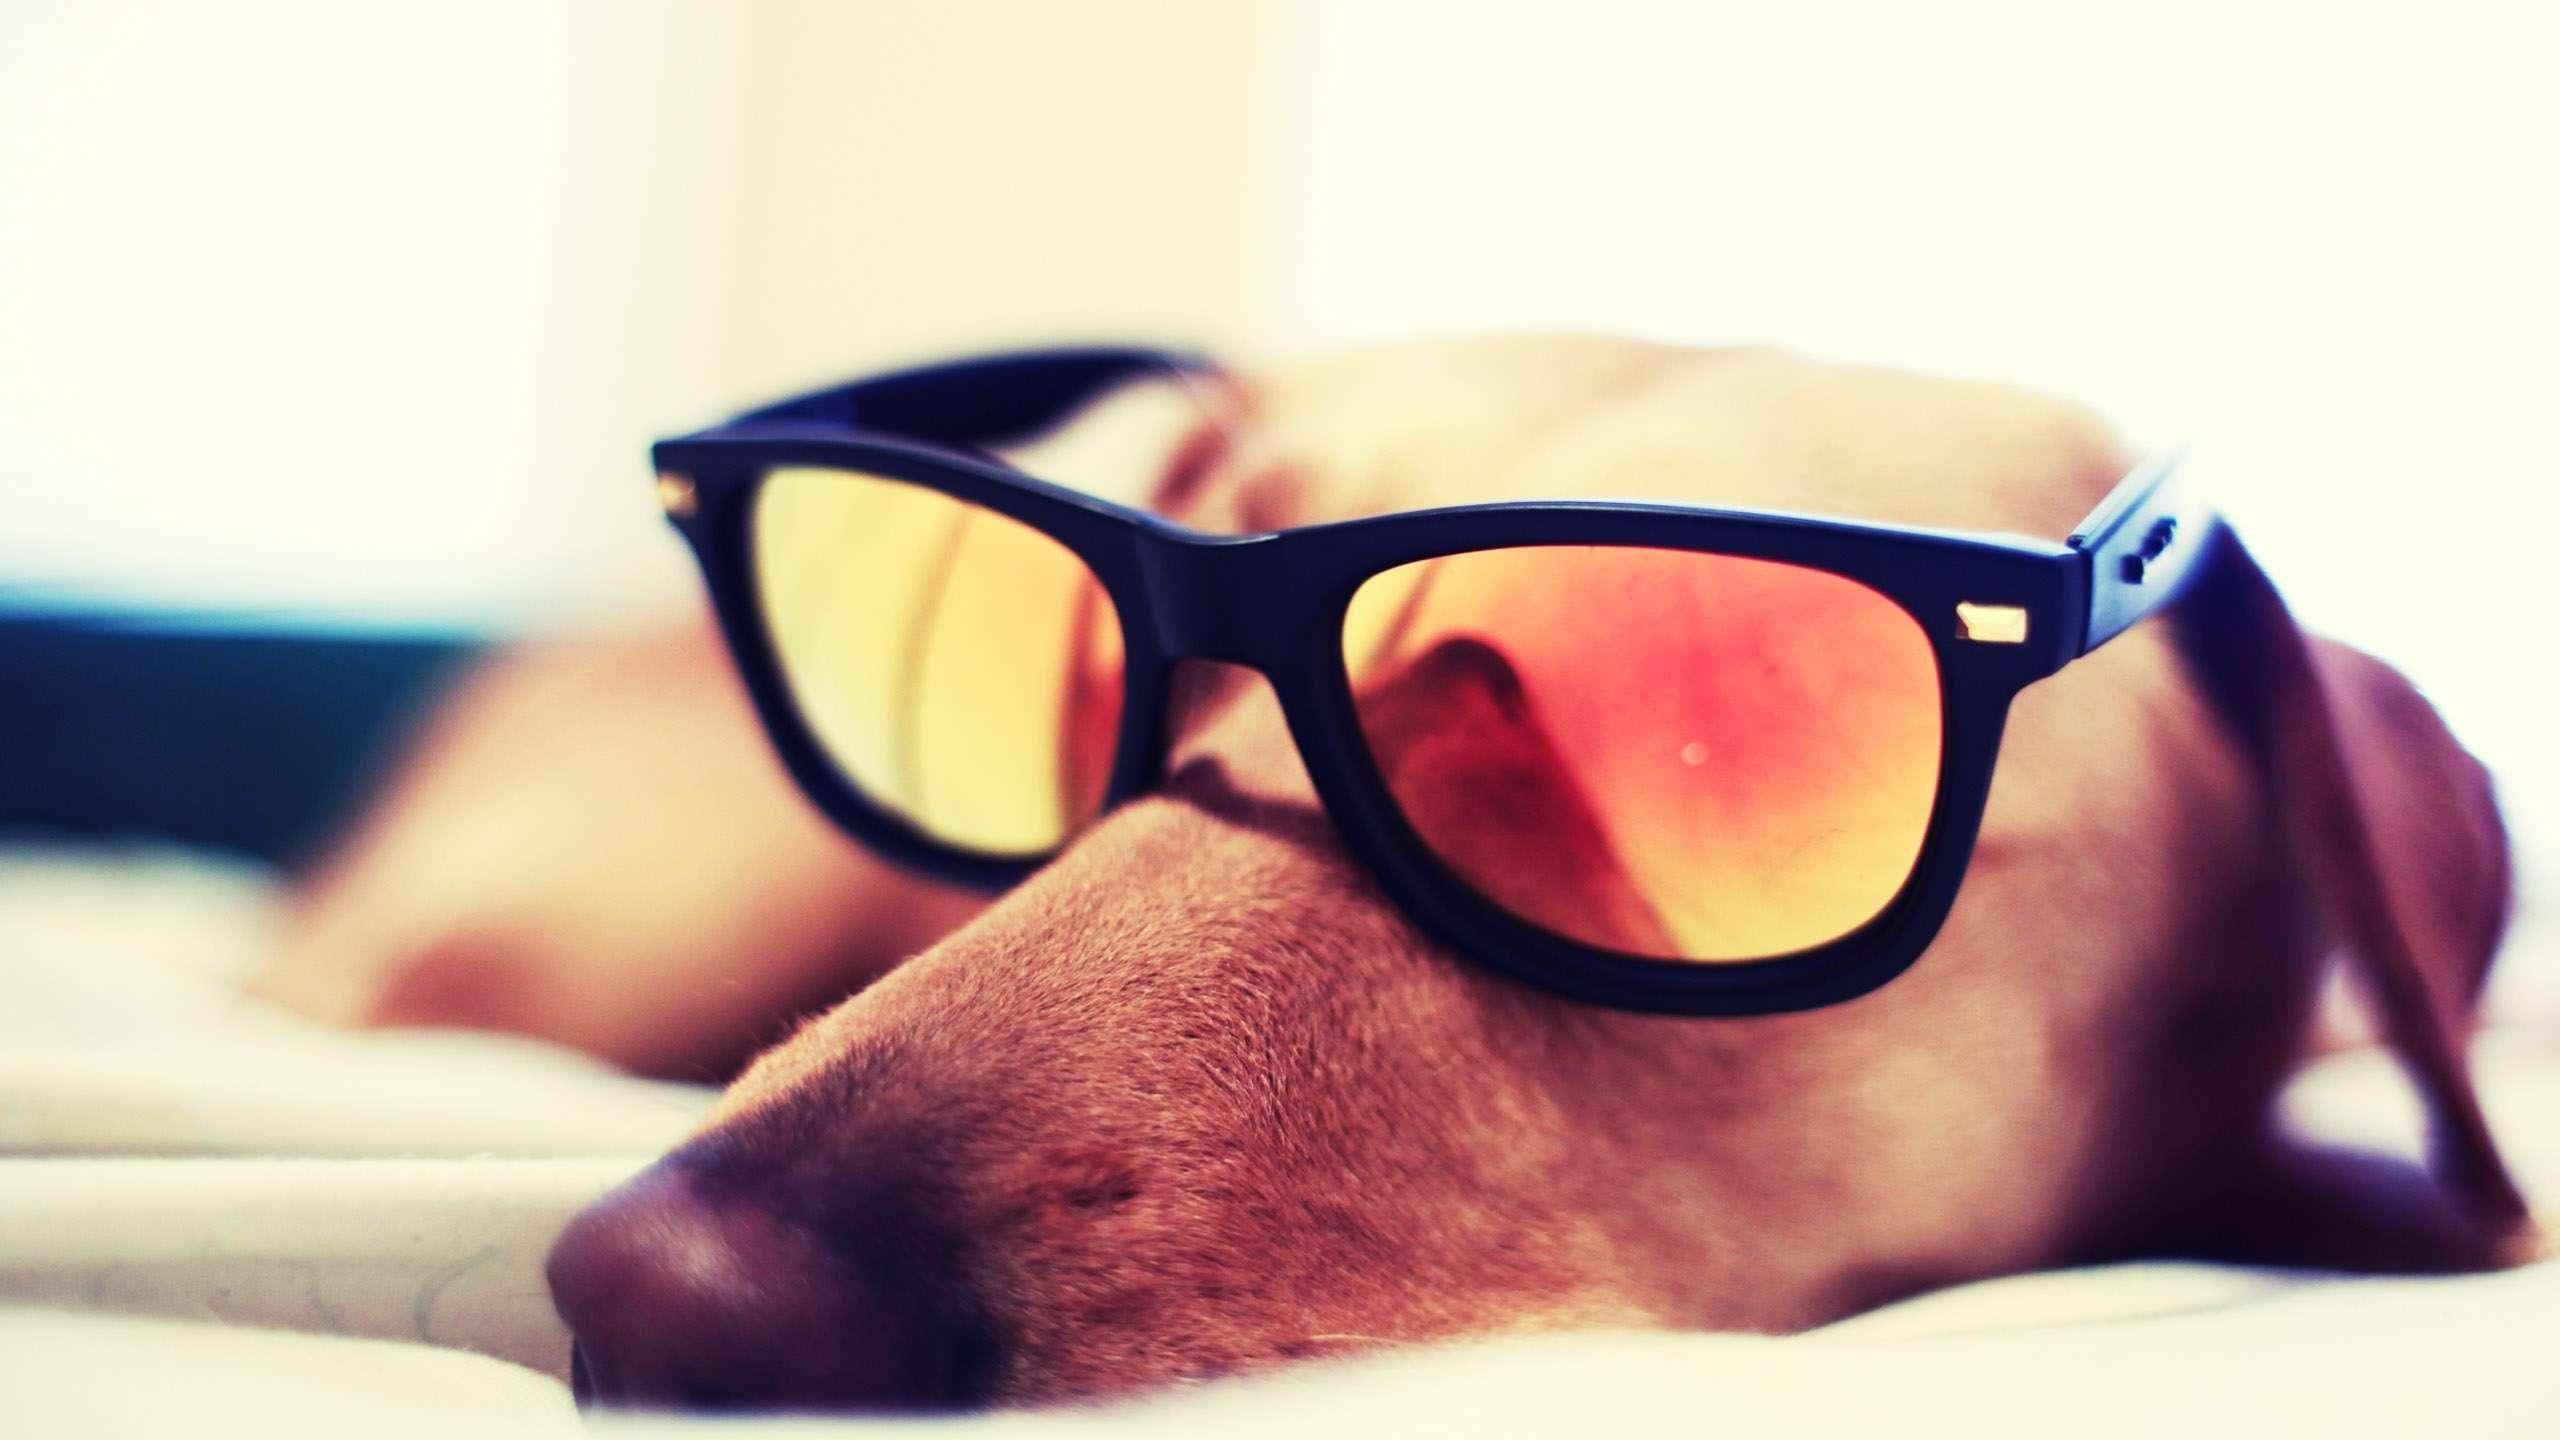 собака парик перчатки очки бесплатно